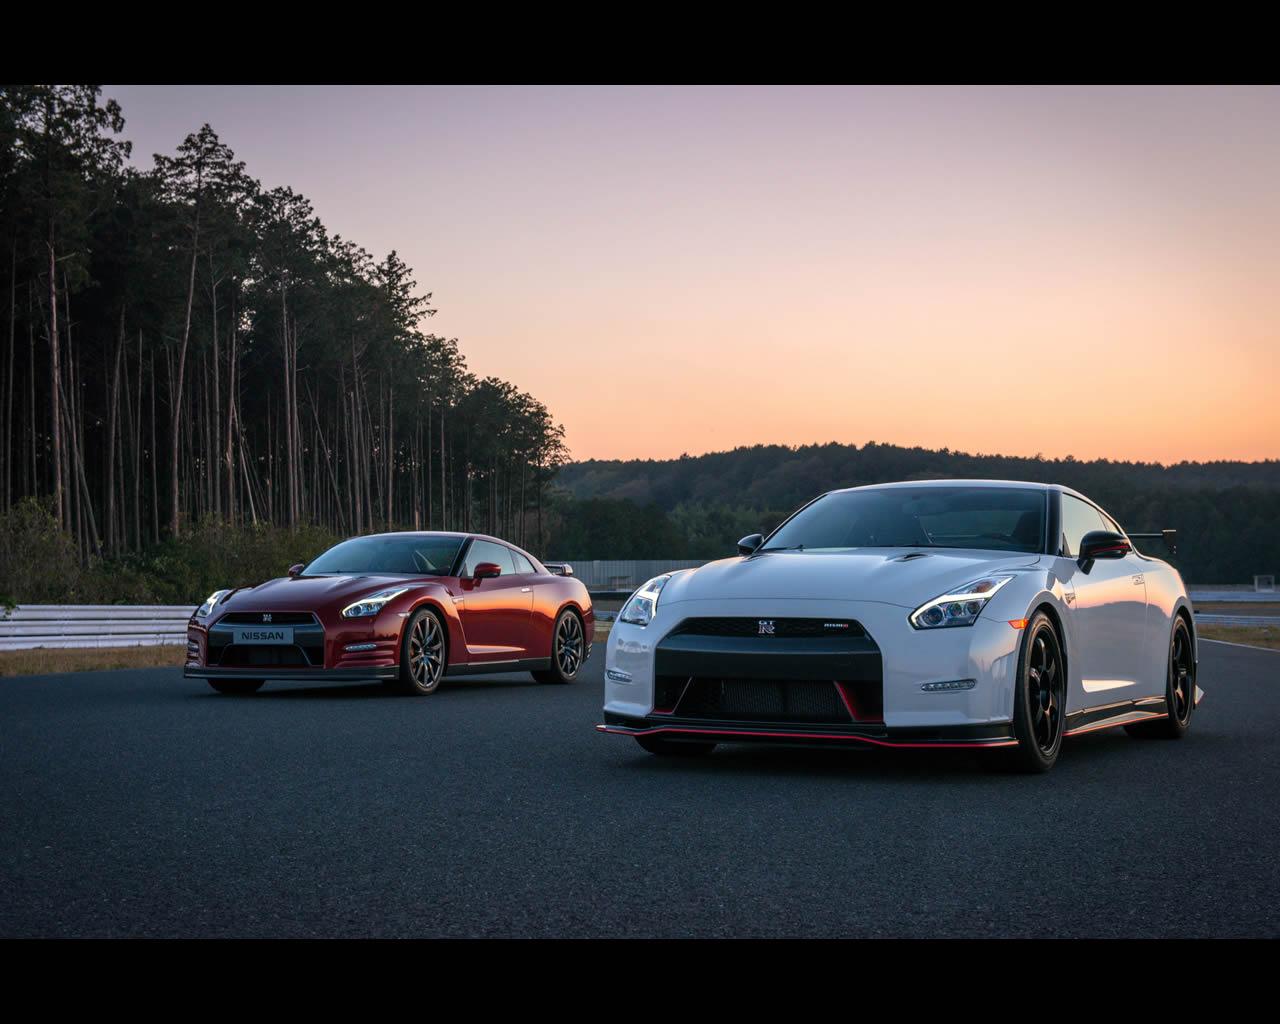 Nissan nissan gtr 2014 : Nissan GT-R-Nismo 2014